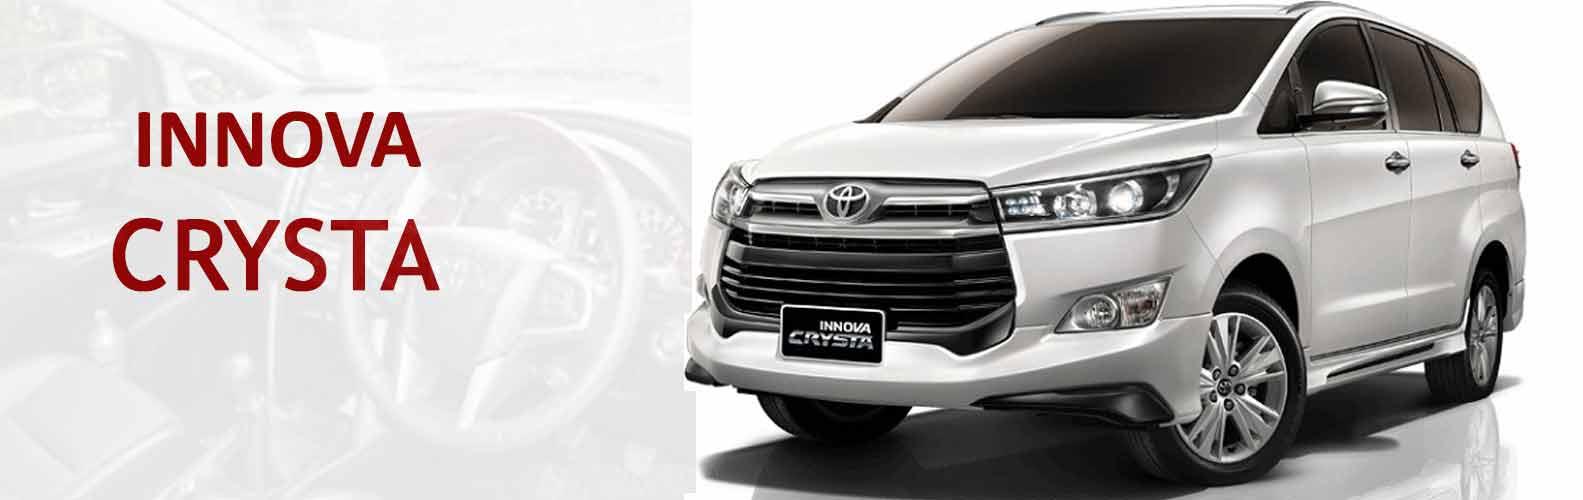 Innova Car Rental Bangalore Outstation | GetMyCabs +91 9008644559 | rent innova bangalore, innova car rental per km in bangalore, innova outstation bangalore, innova outstation rates bangalore, - GL27760